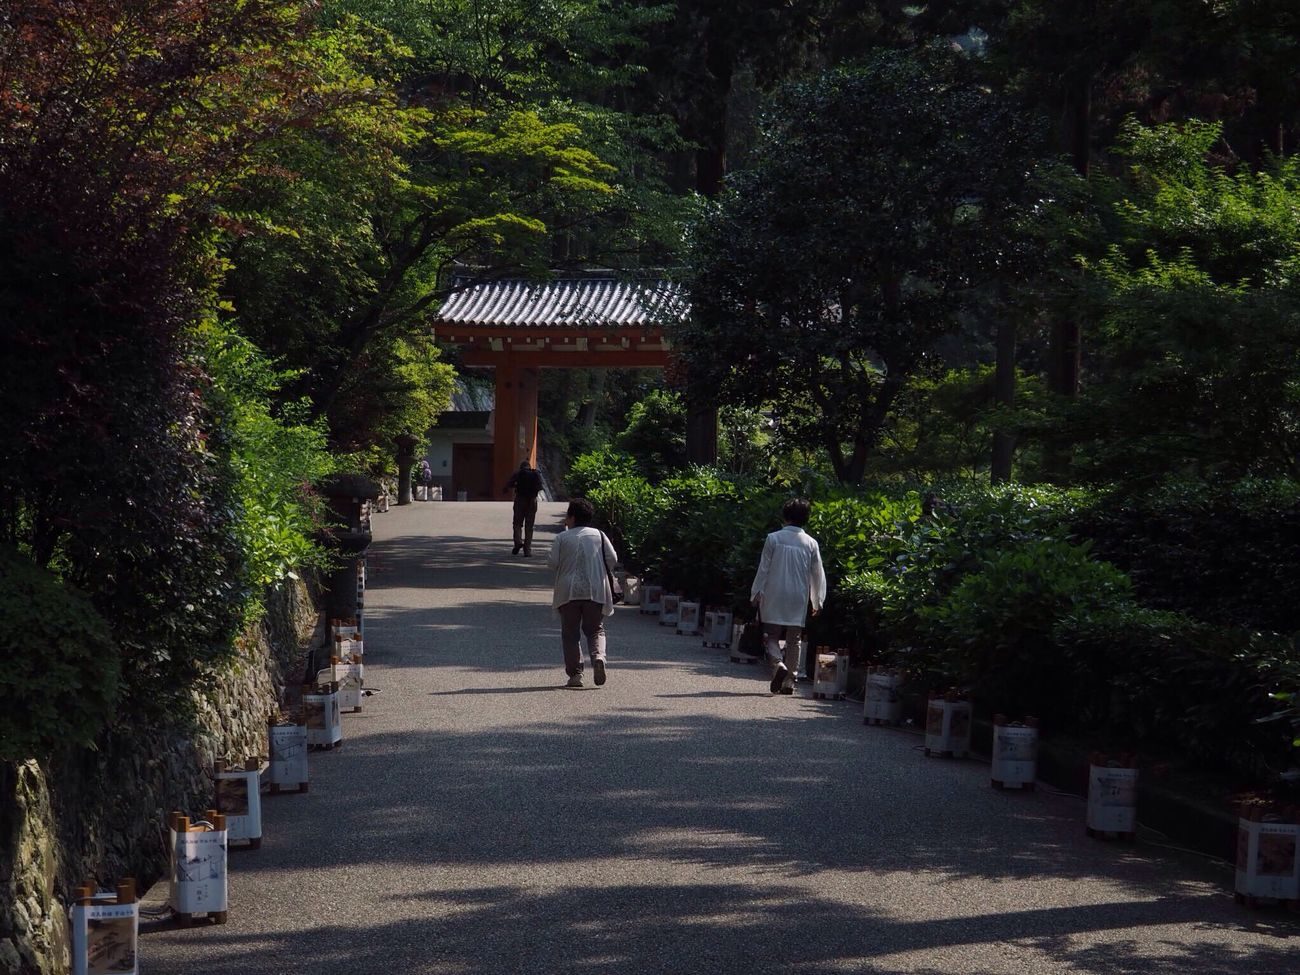 Kyoto Japan Uji Mimurotoji Temple Gate Architecture Day People Beauty In Nature Green Healing Walking Tree Outdoors Nature Olympus PEN-F 京都 日本 宇治 三室戸寺